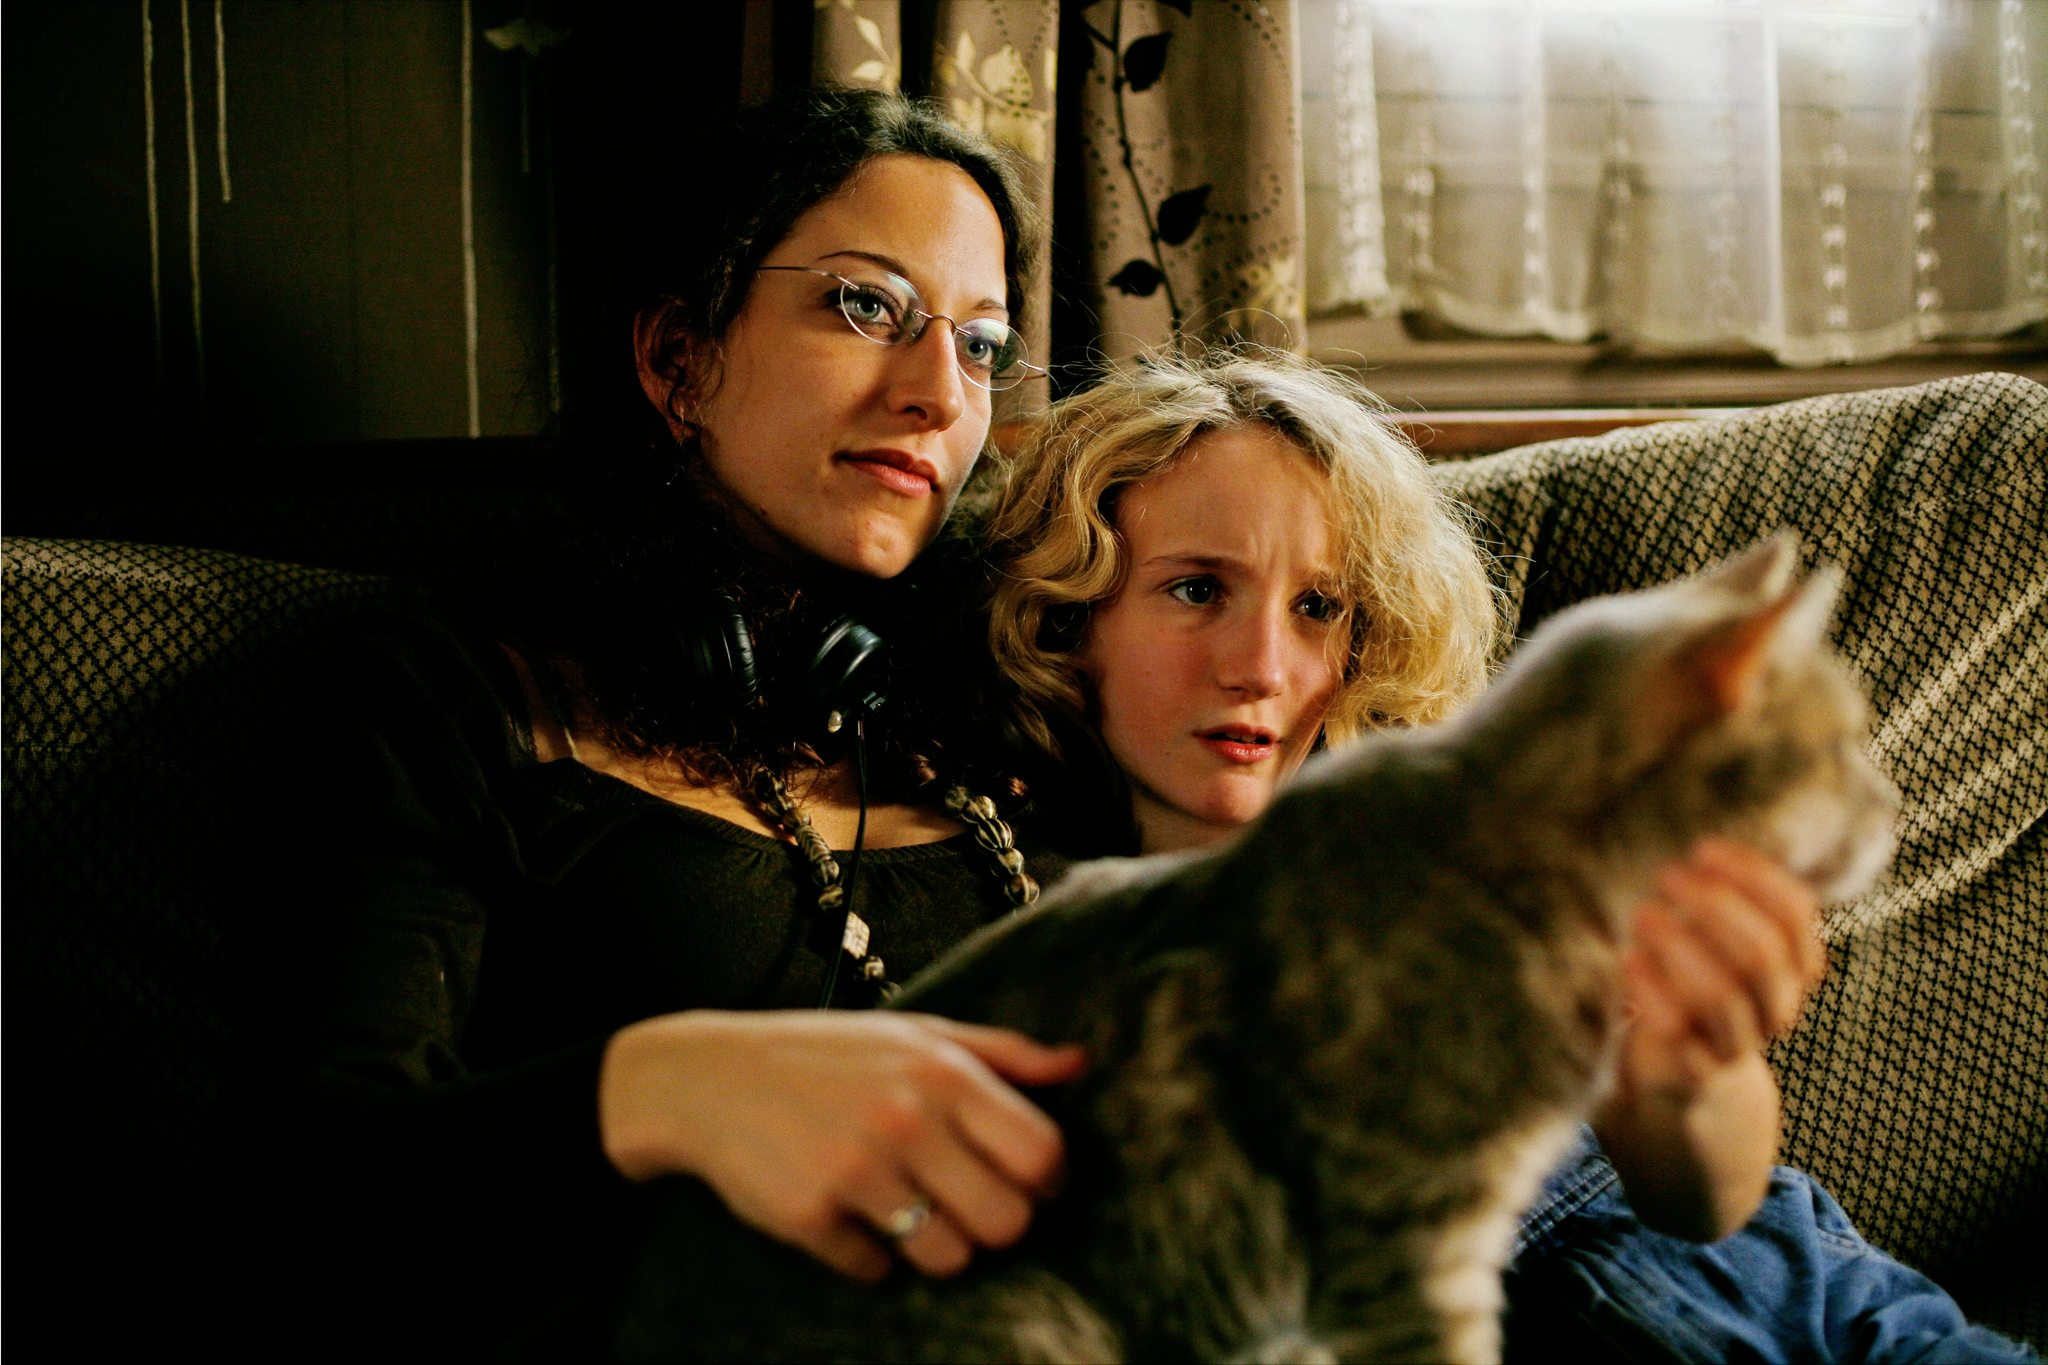 Mona Achache and Garance Le Guillermic in Le hérisson (2009)